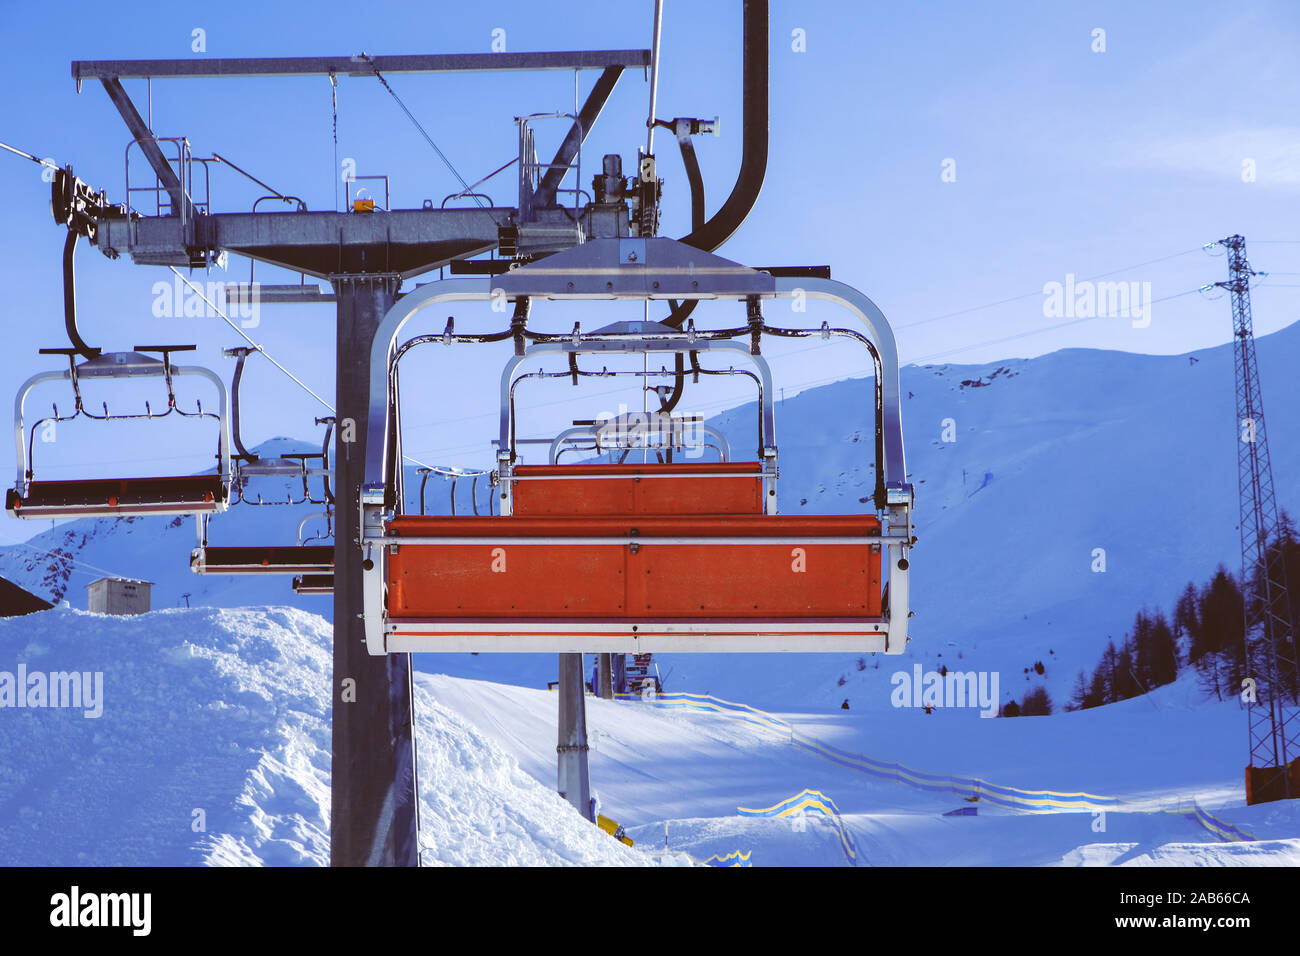 Chairlift or elevated passenger ropeway at ski area. Winter ski resort. Stock Photo